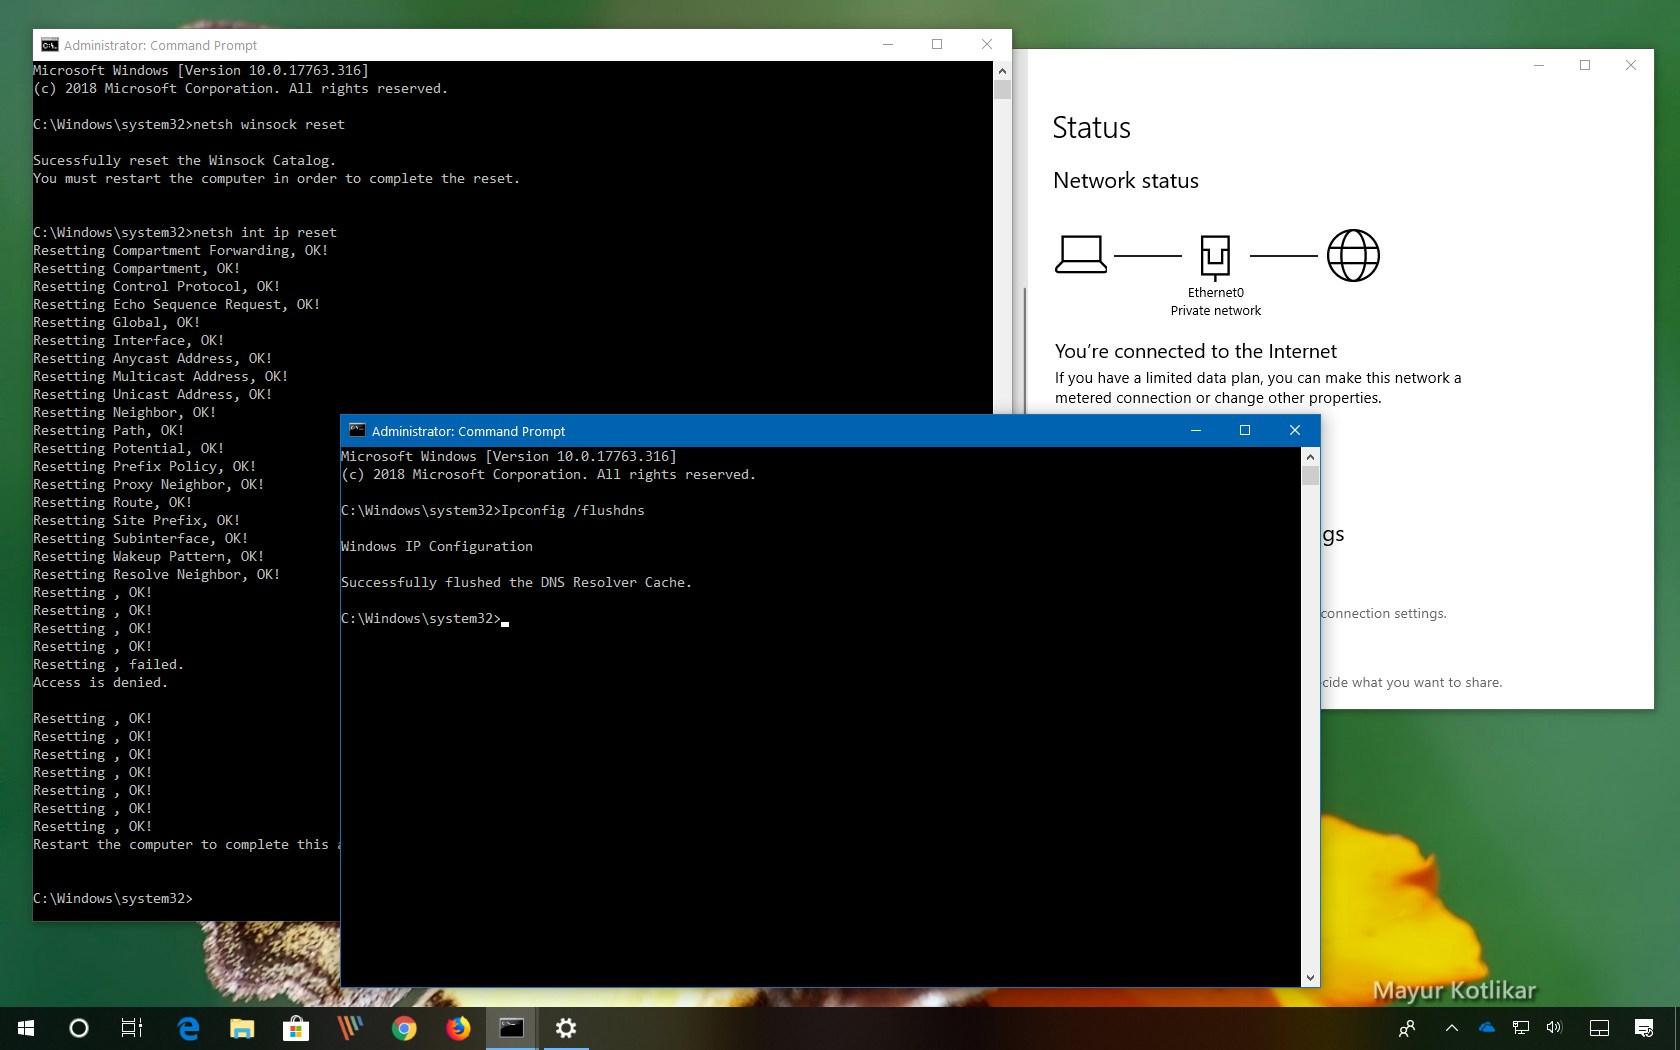 Reset WinSock to fix Unidentified Network on Windows 10